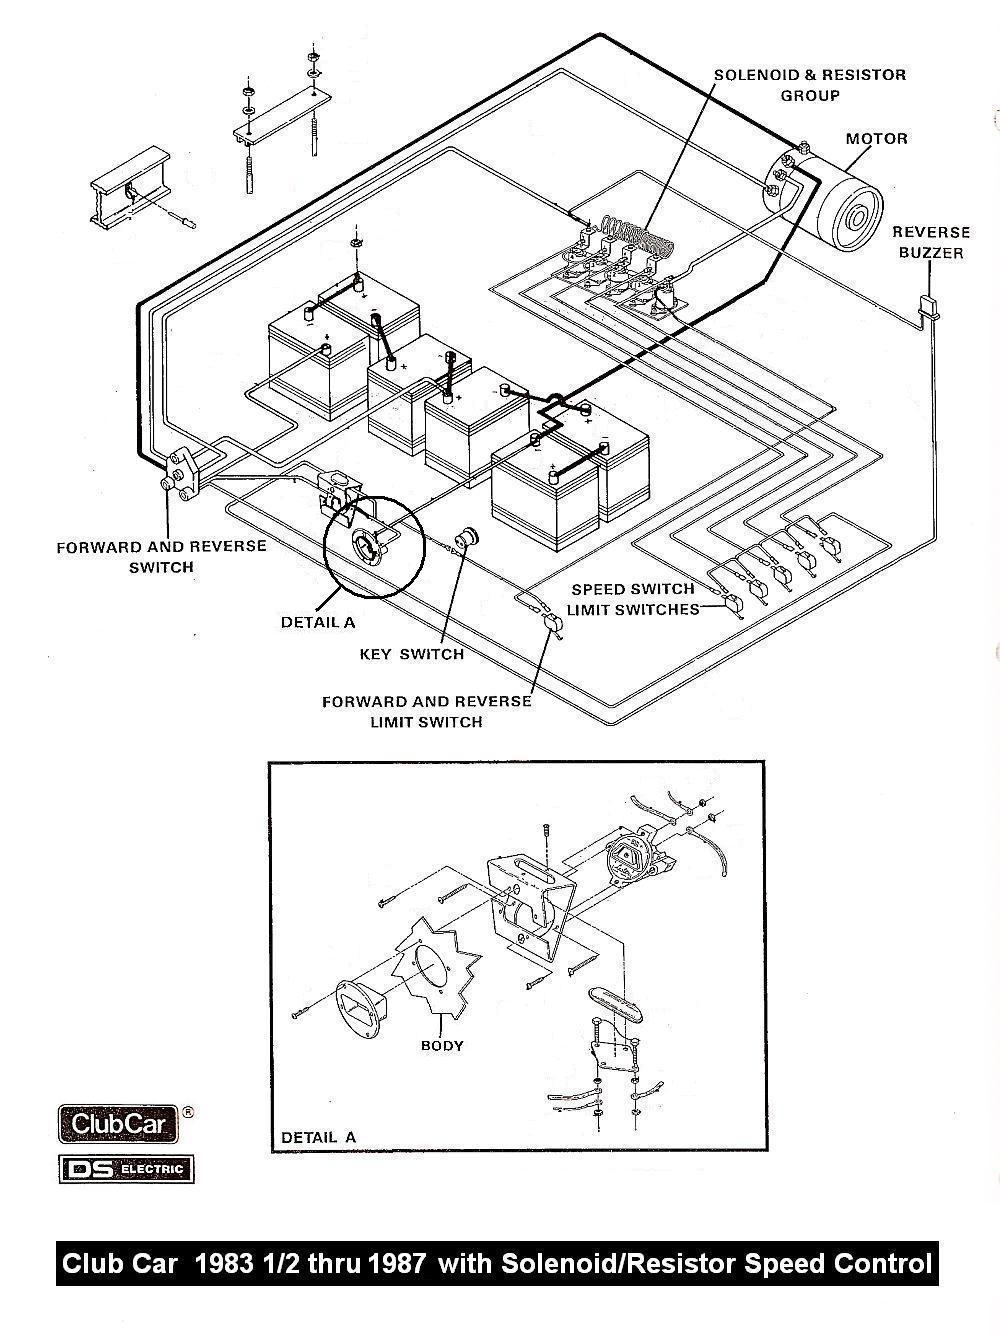 48 Volt Club Car Wiring Diagram - Wiring Site Resource Wiring Site Resource